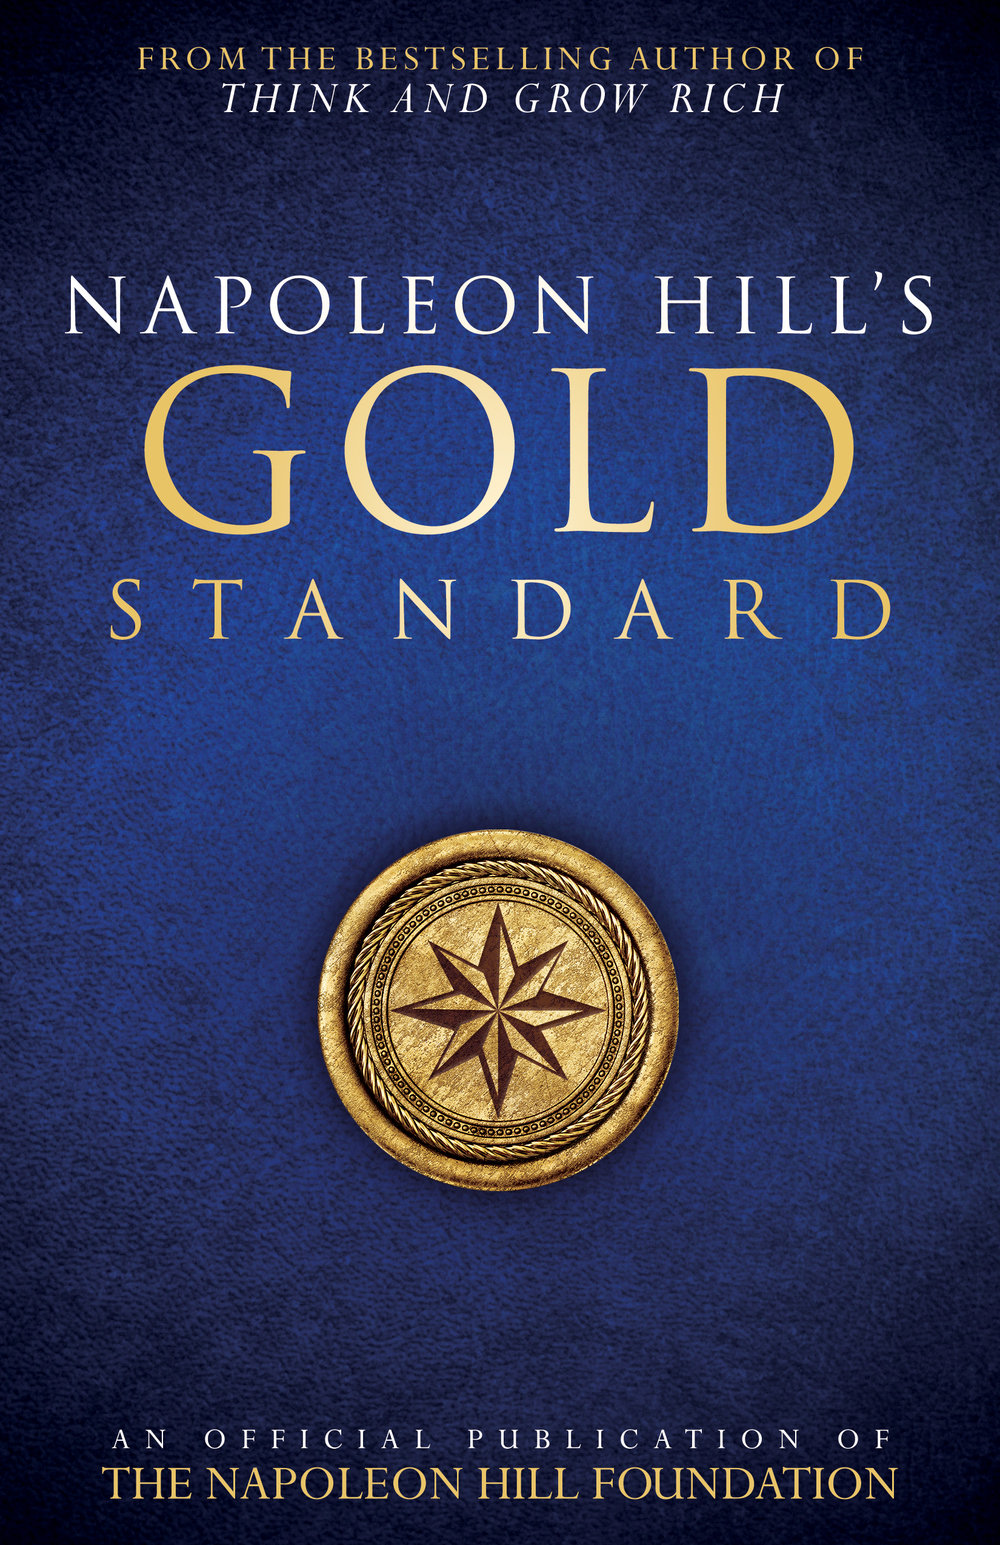 Napoleon_Hill's_Gold_Standard.jpg